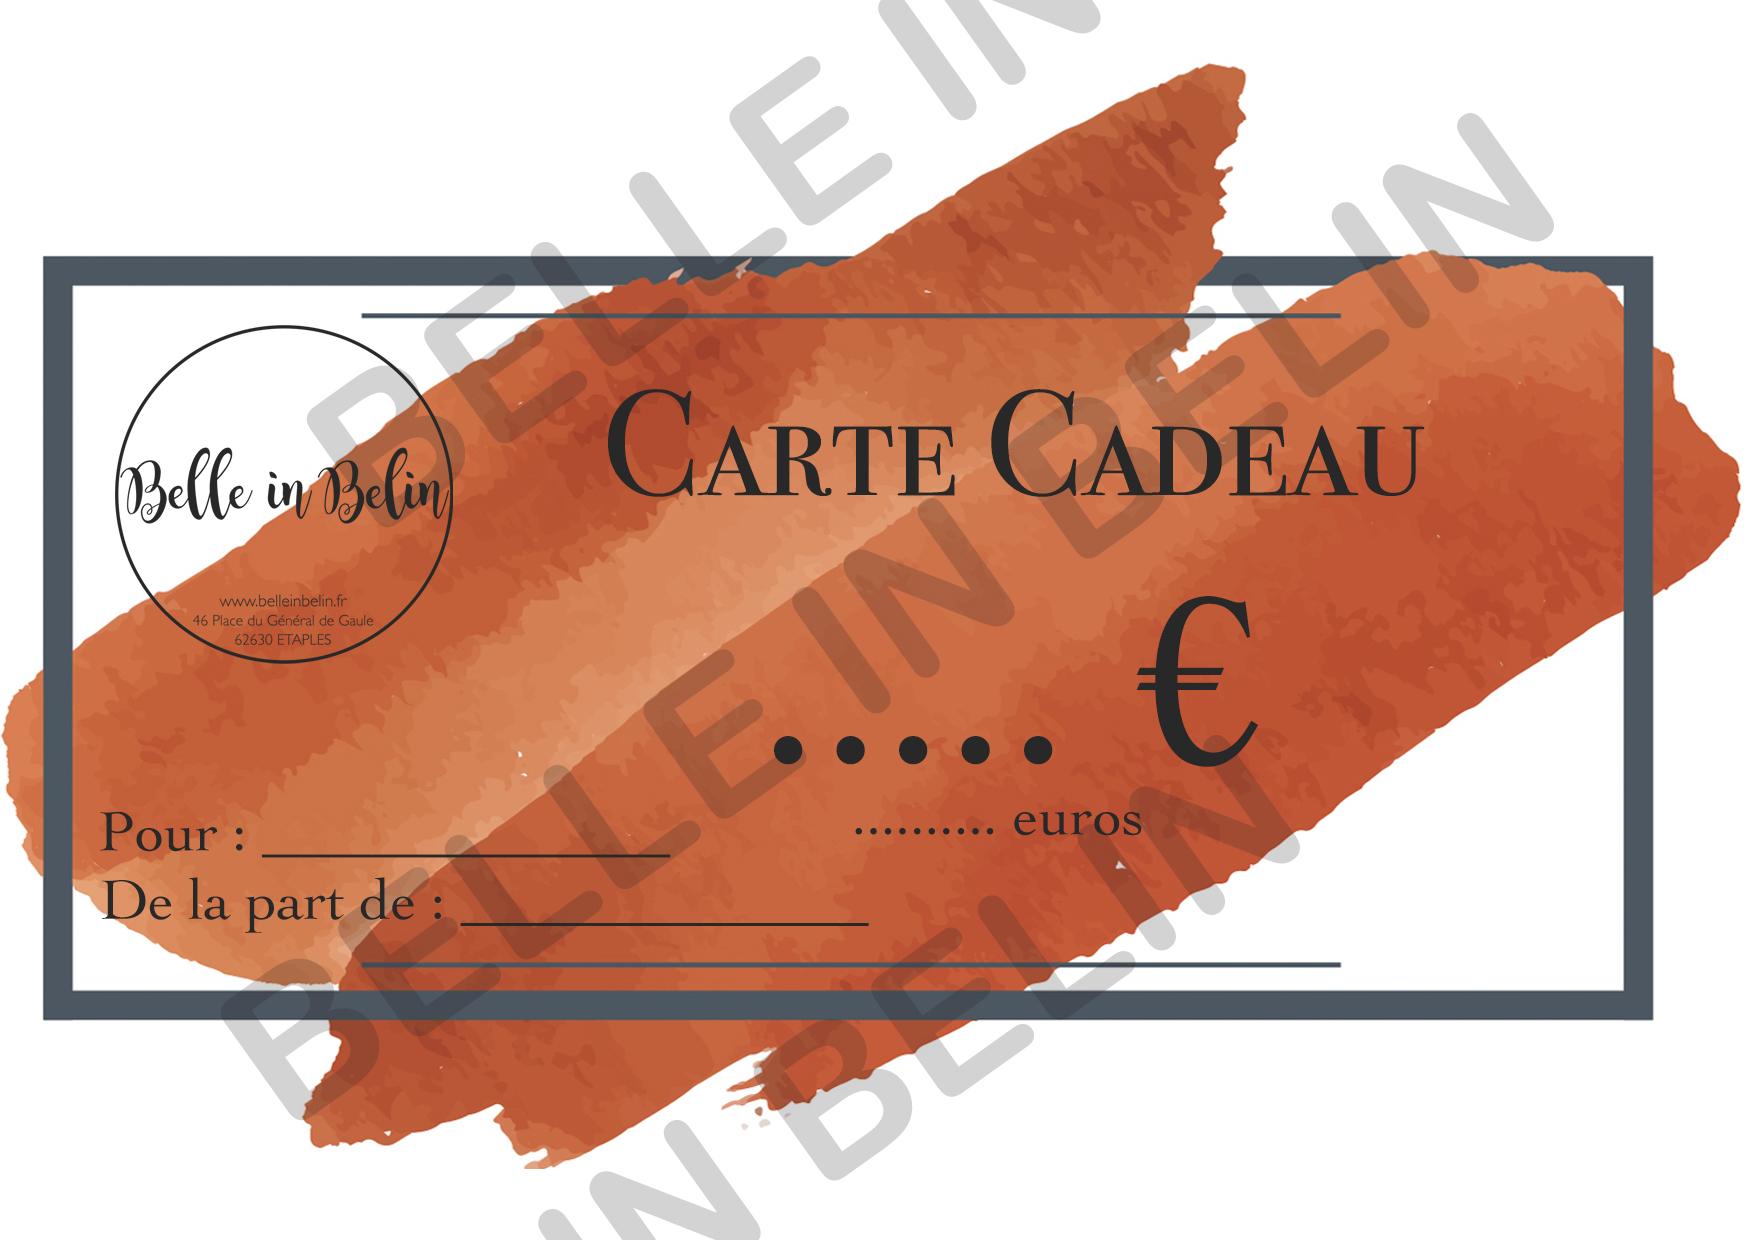 CARTE CADEAU 2020 INTERNET